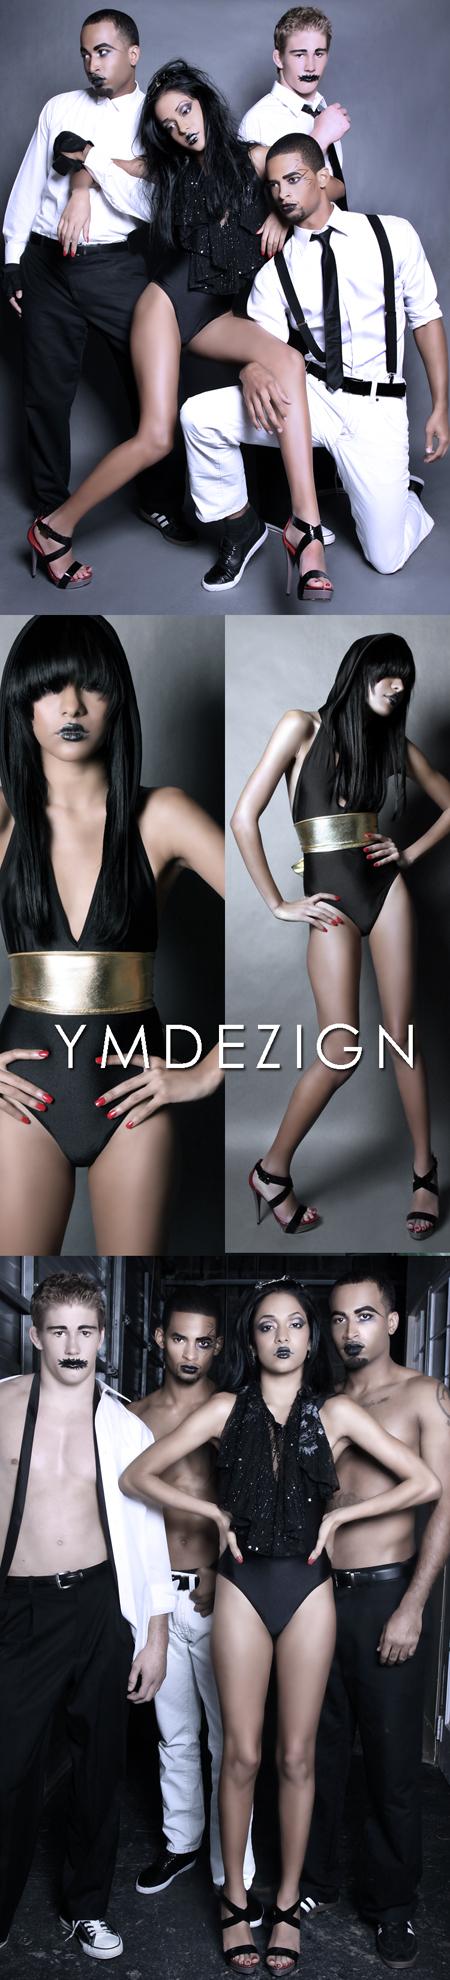 YMDEZIGN Studio Dec 04, 2009 YMDEZIGN Male models (MUA: Terrell), Female (MUA: Eloria)